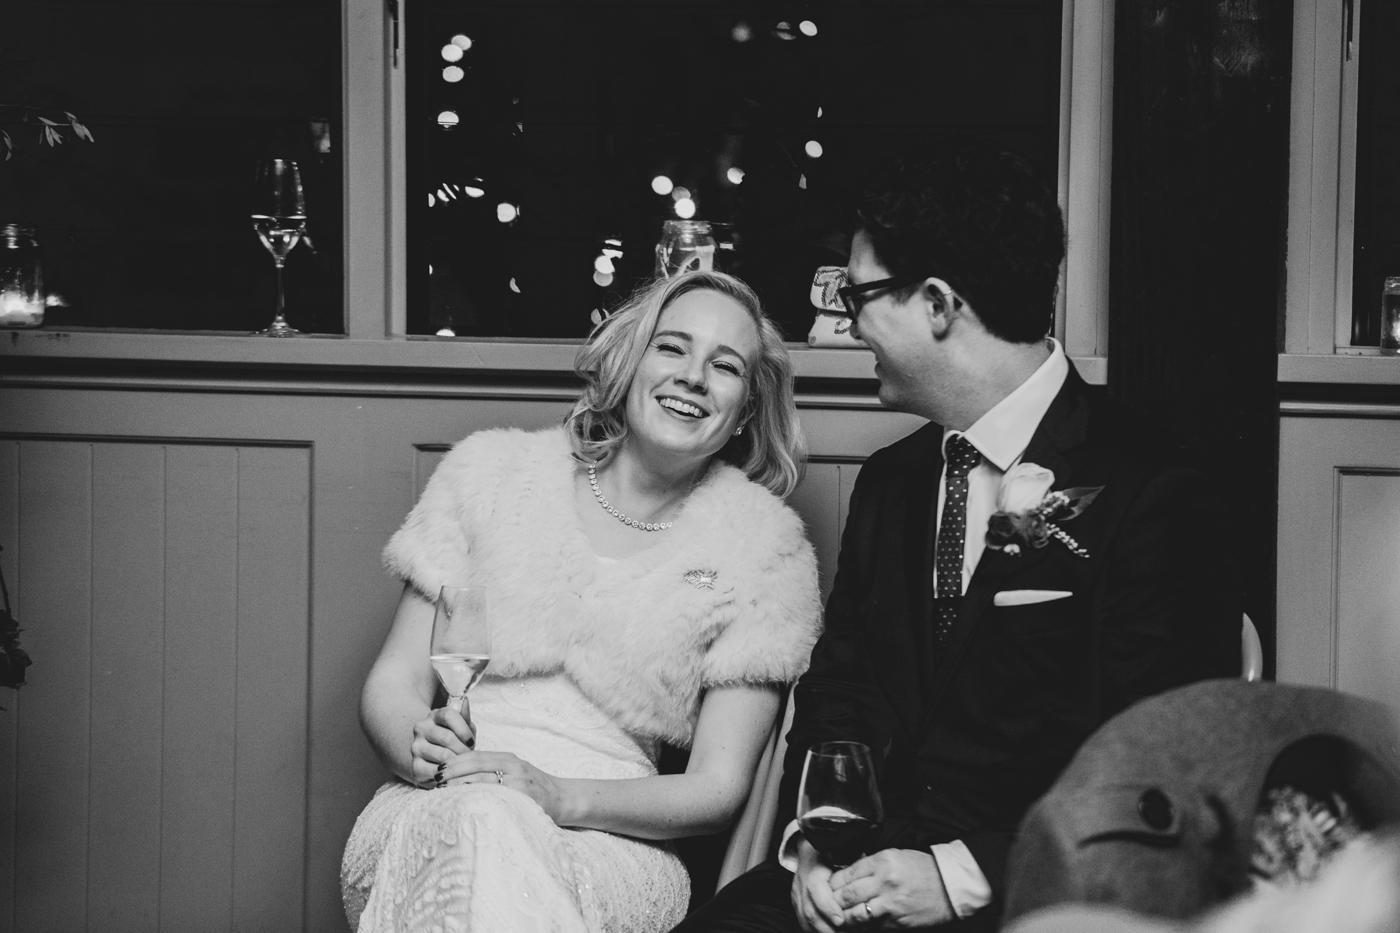 Jo & Tom Wedding - The Grounds of Alexandria - Samantha Heather Photography-295.jpg